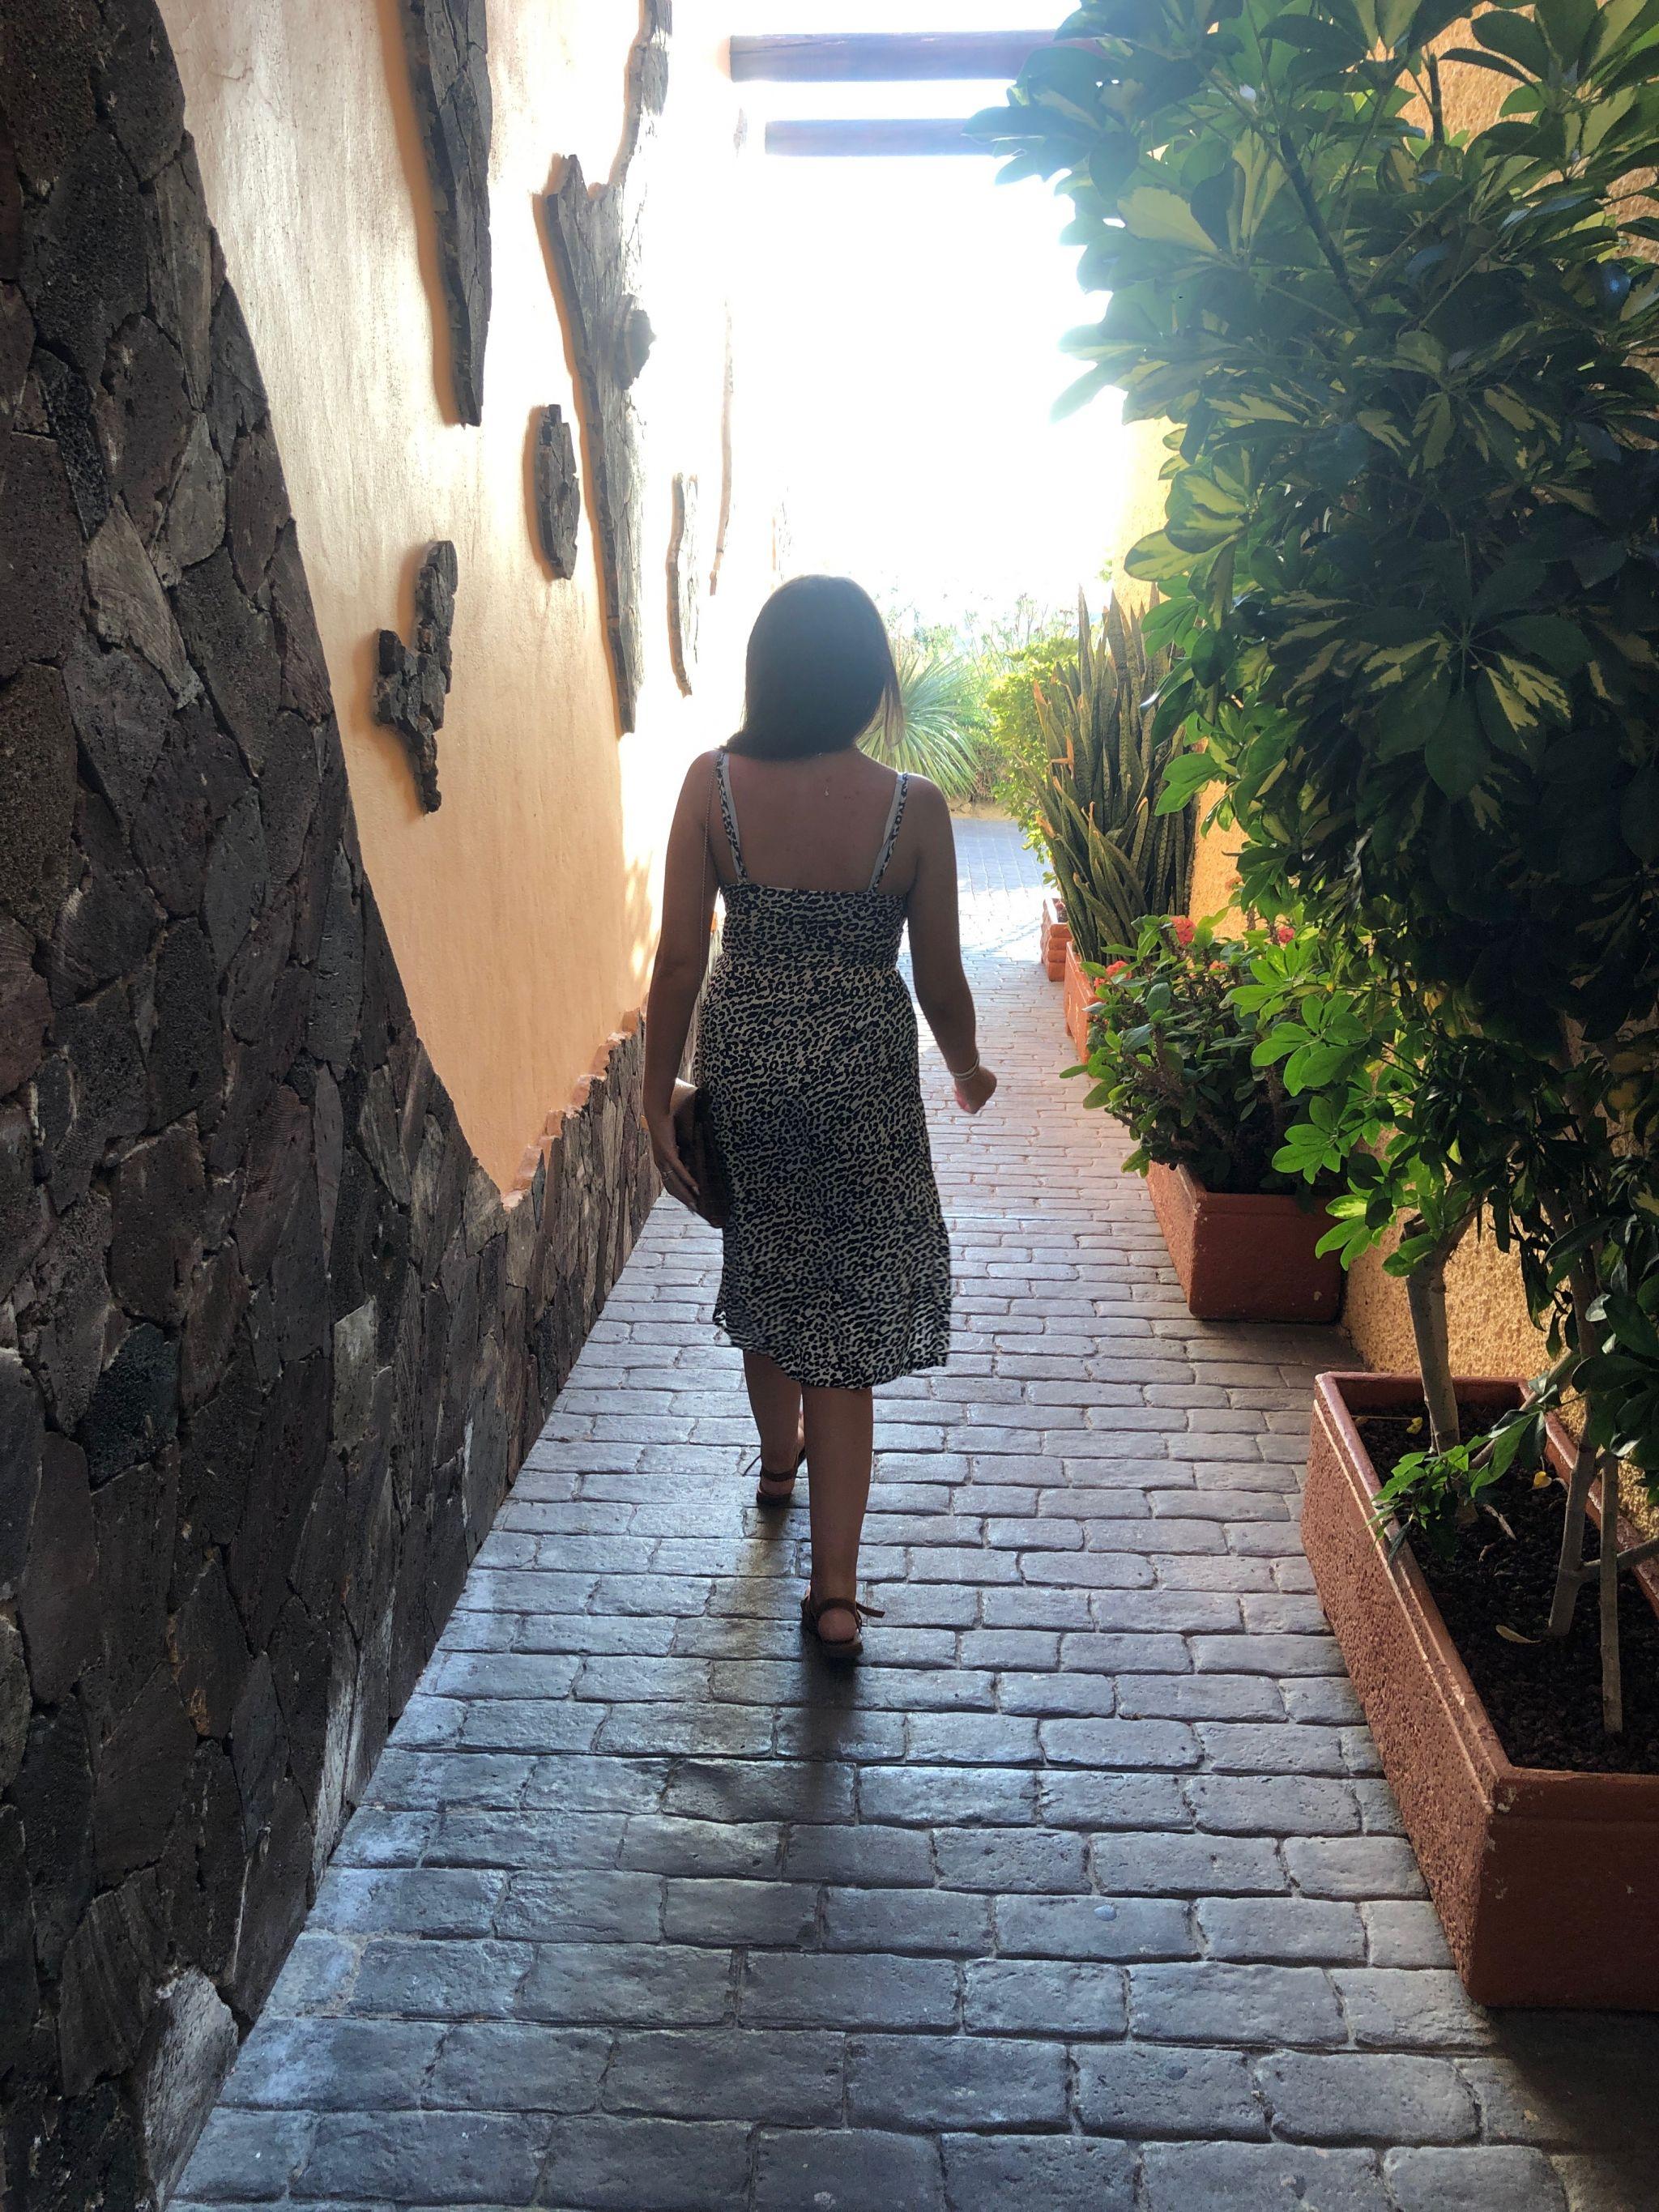 Tenerife Getaway- Part 1